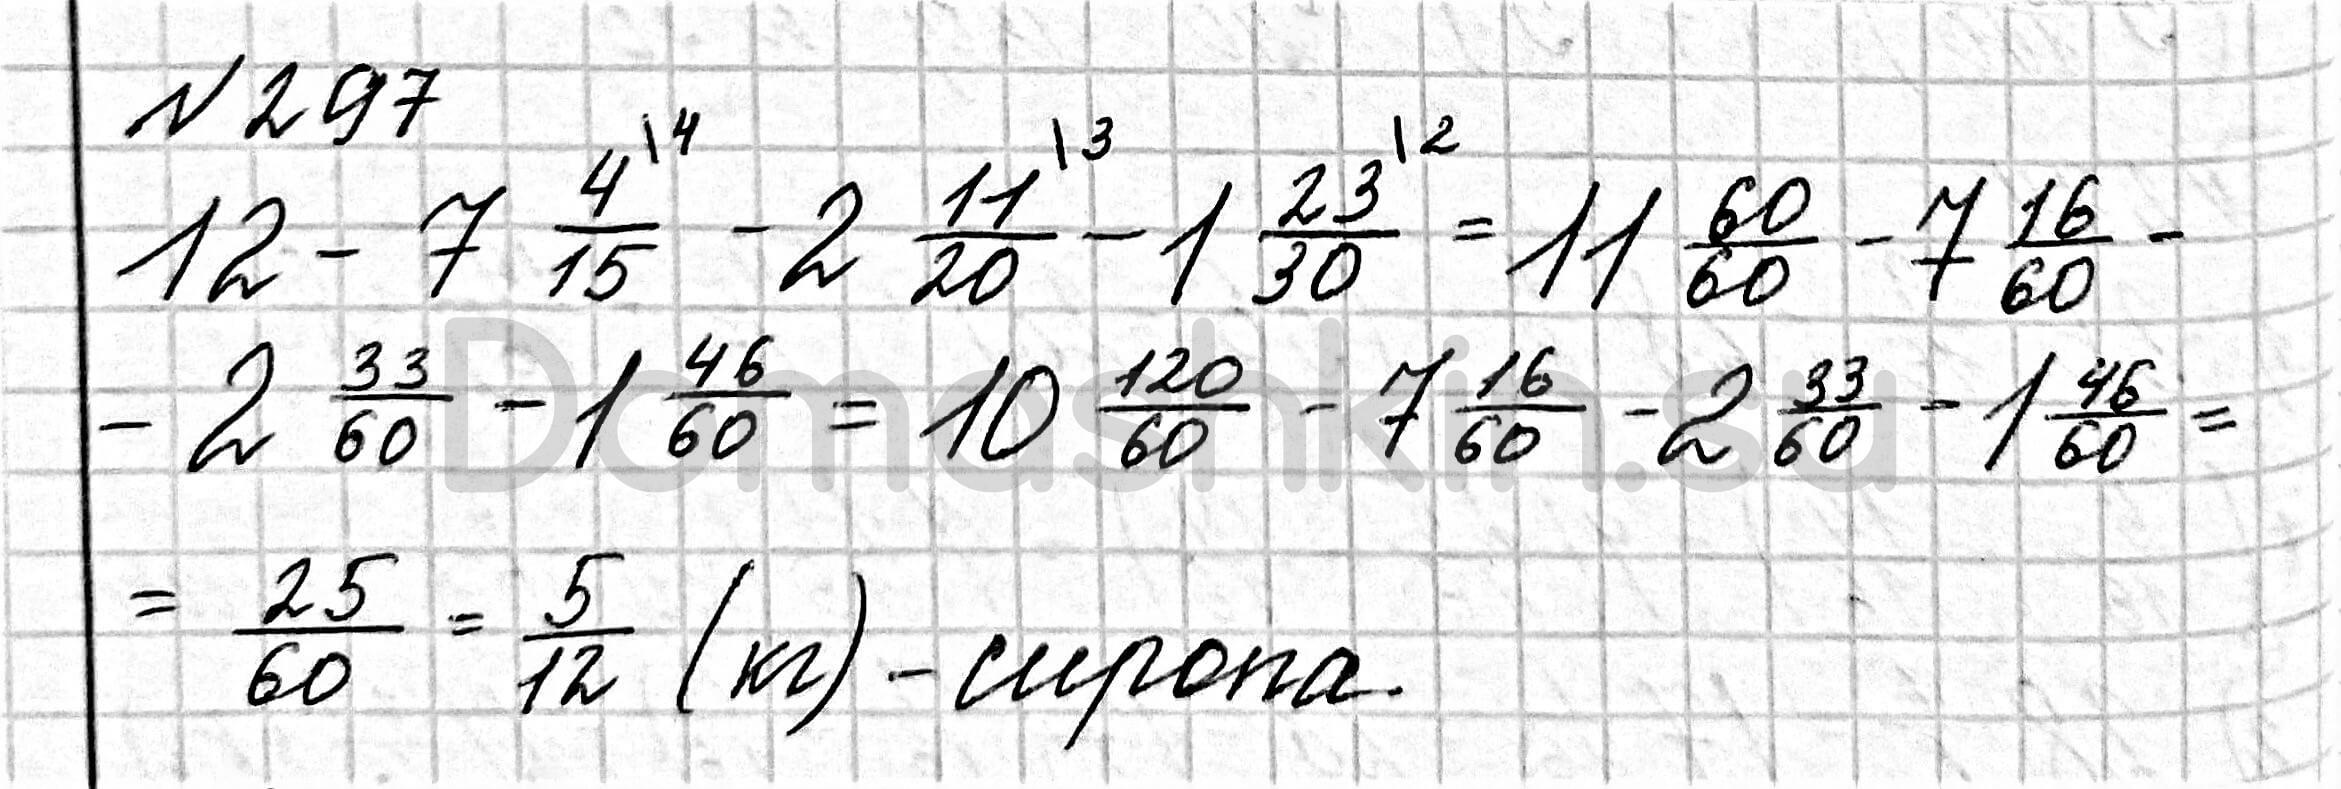 Математика 6 класс учебник Мерзляк номер 297 решение